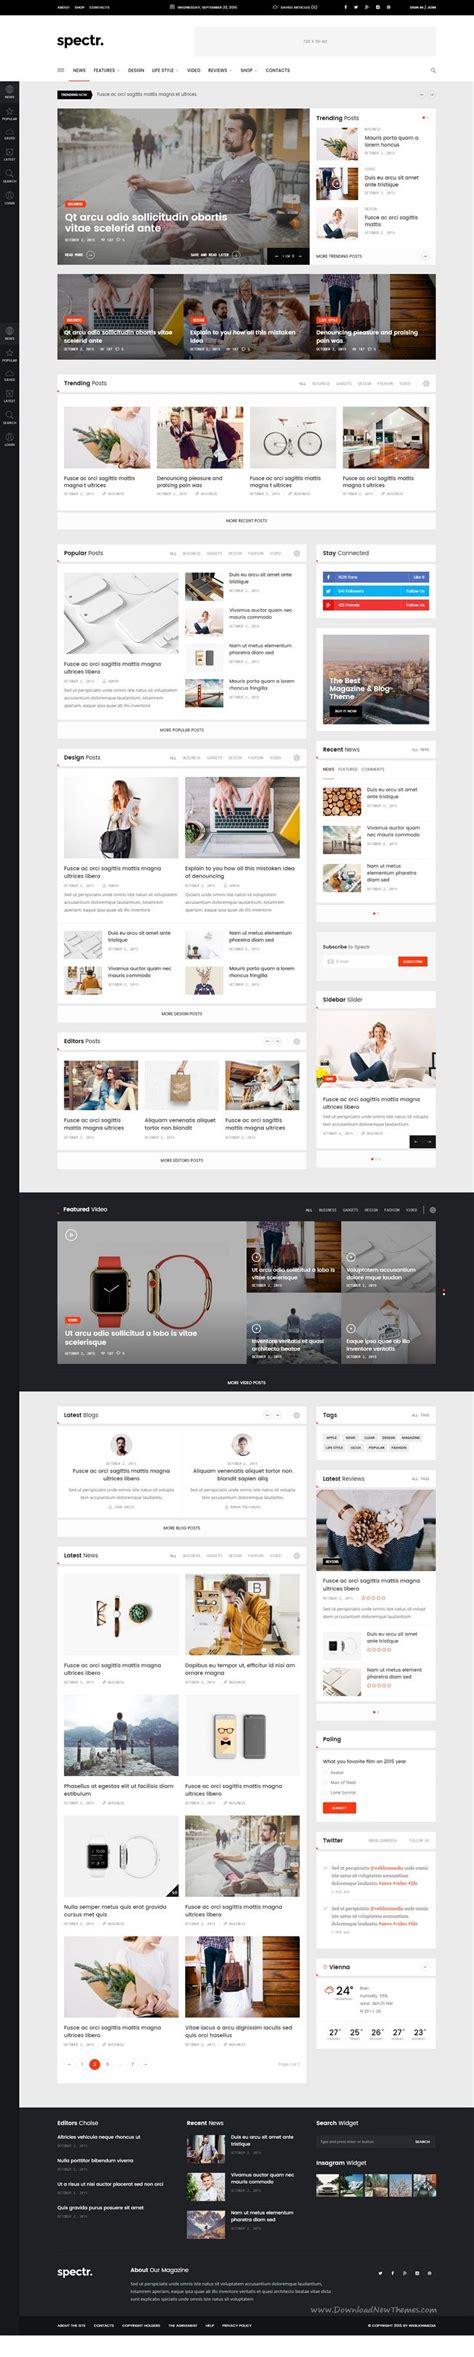 25 Best Ideas About Sharepoint Design On Pinterest Pantone Pantone Color Bridge And Textur Sharepoint Responsive Design Templates